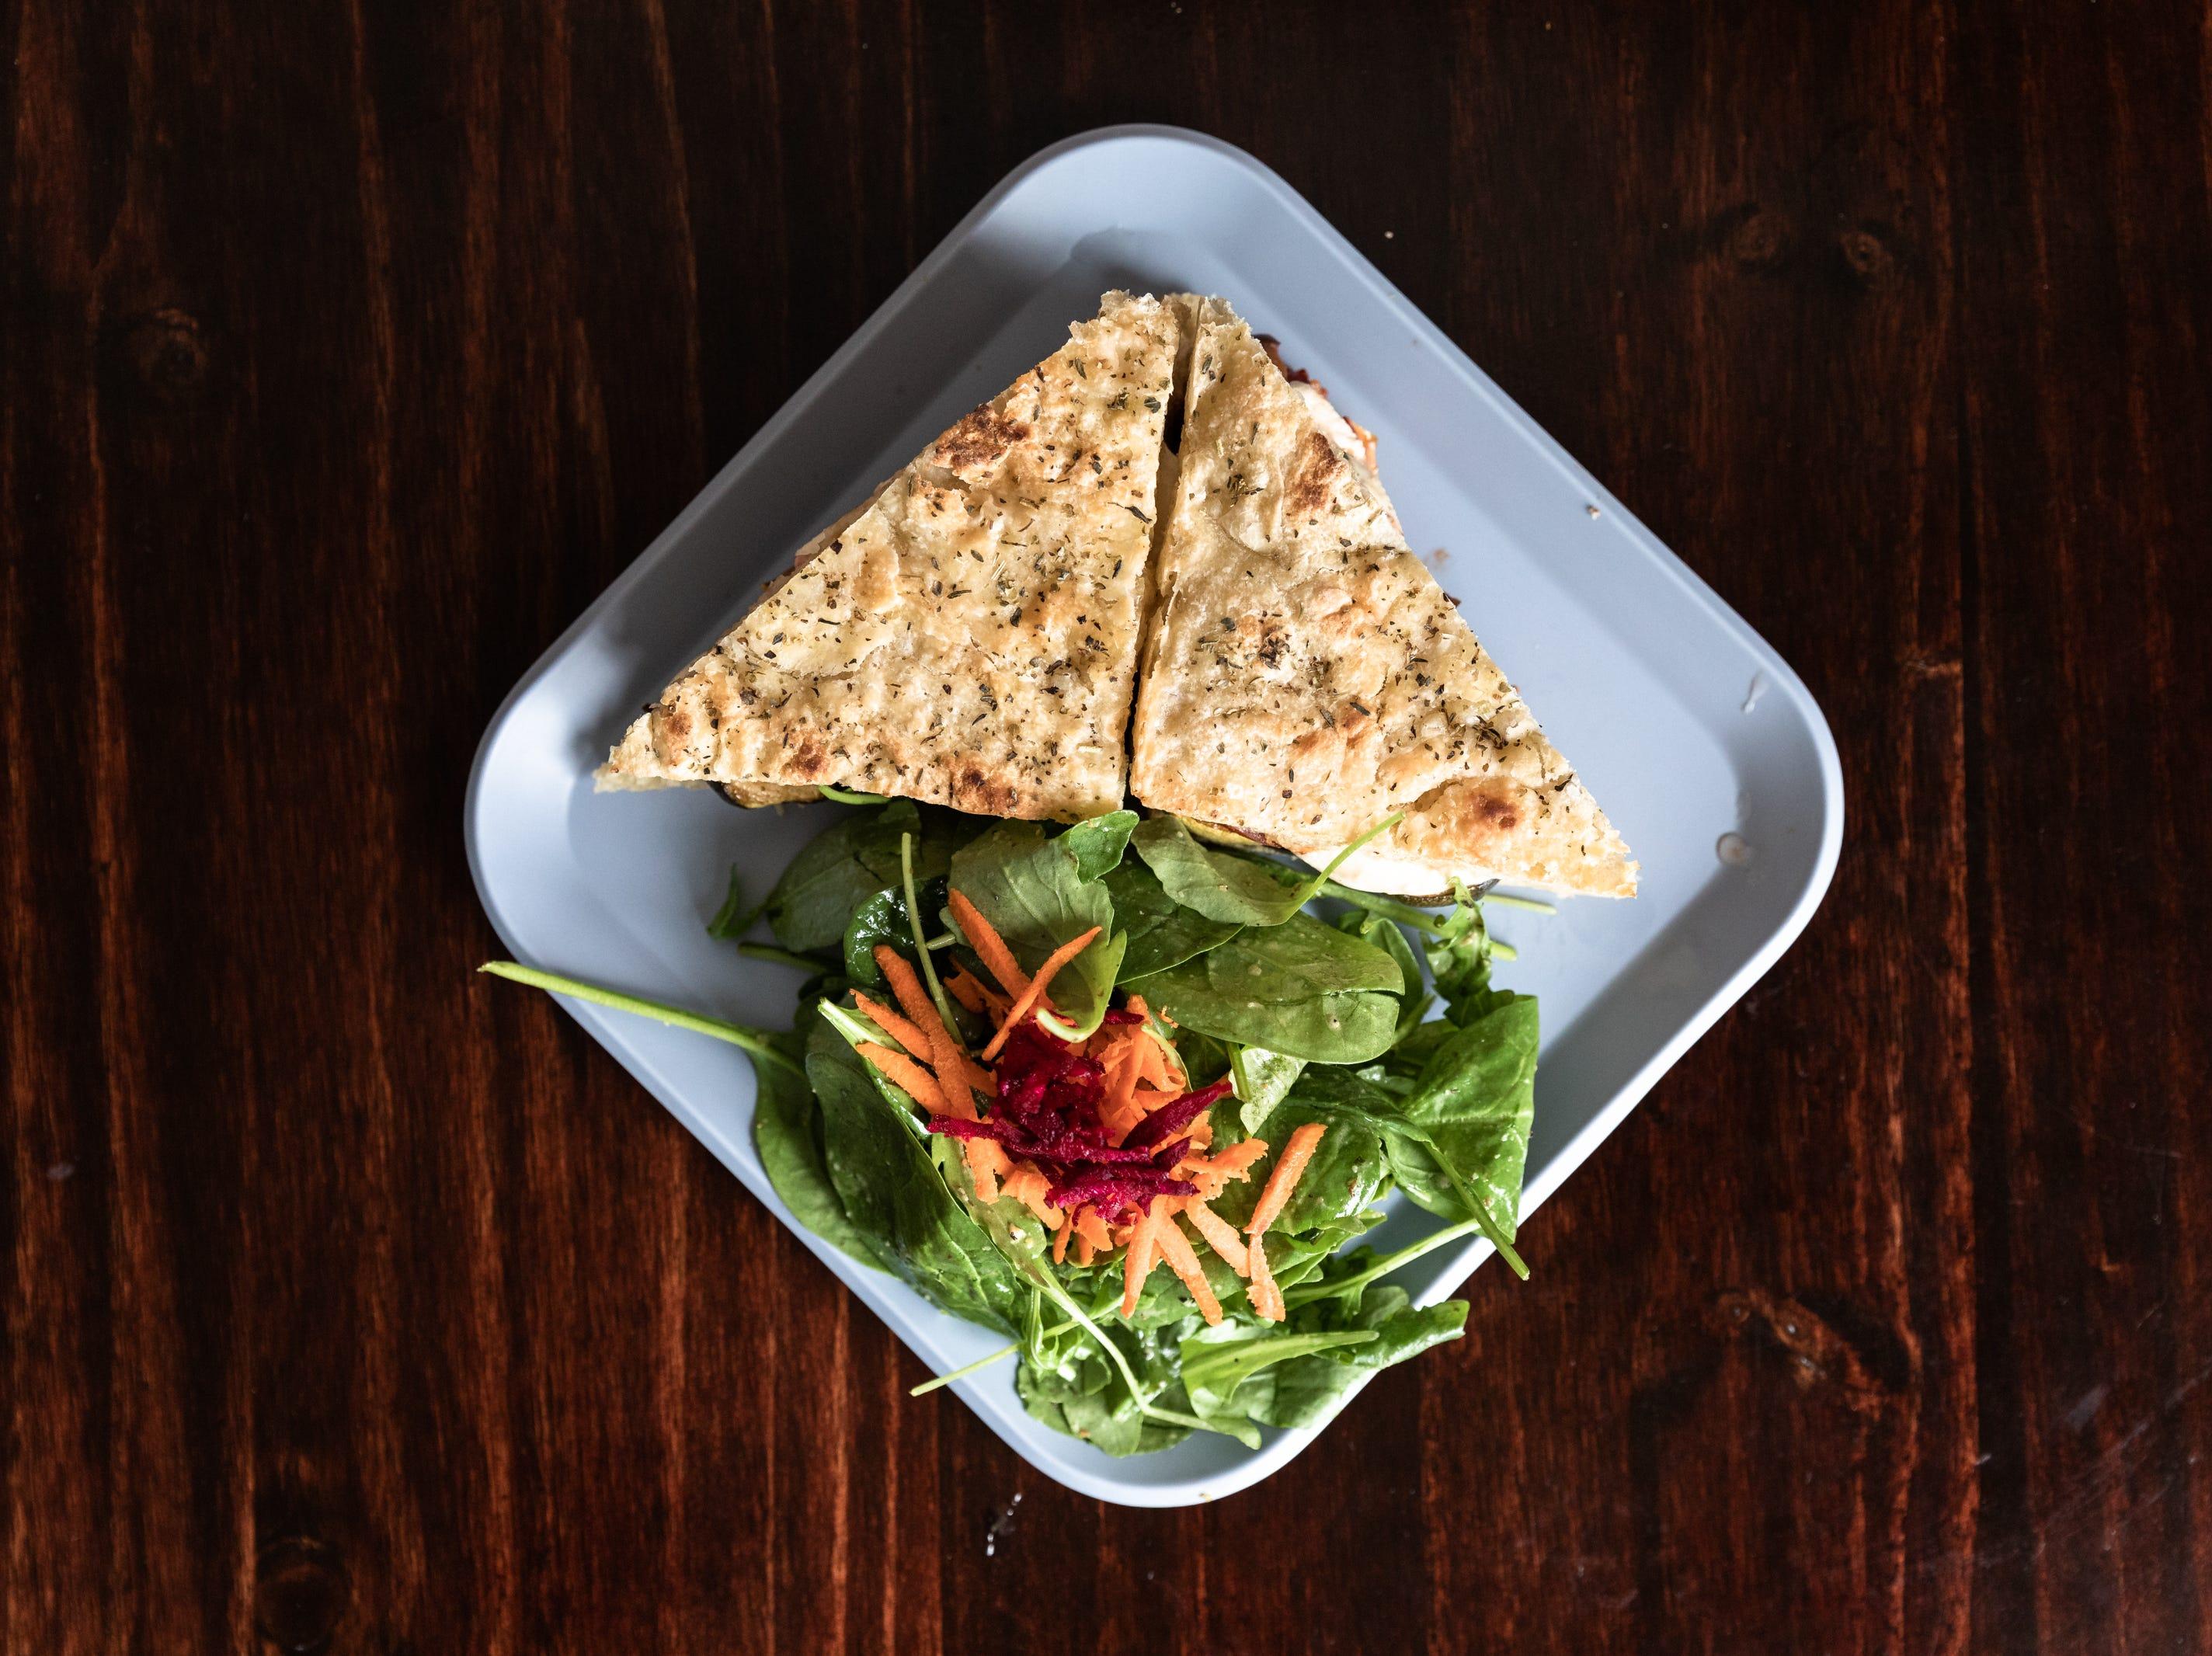 Simple Cafe & Juice Bar's roasted veggie sandwich with buffalo mozzarella, roasted eggplant, tomato, squash, zucchini, and peppered balsamic mayo.